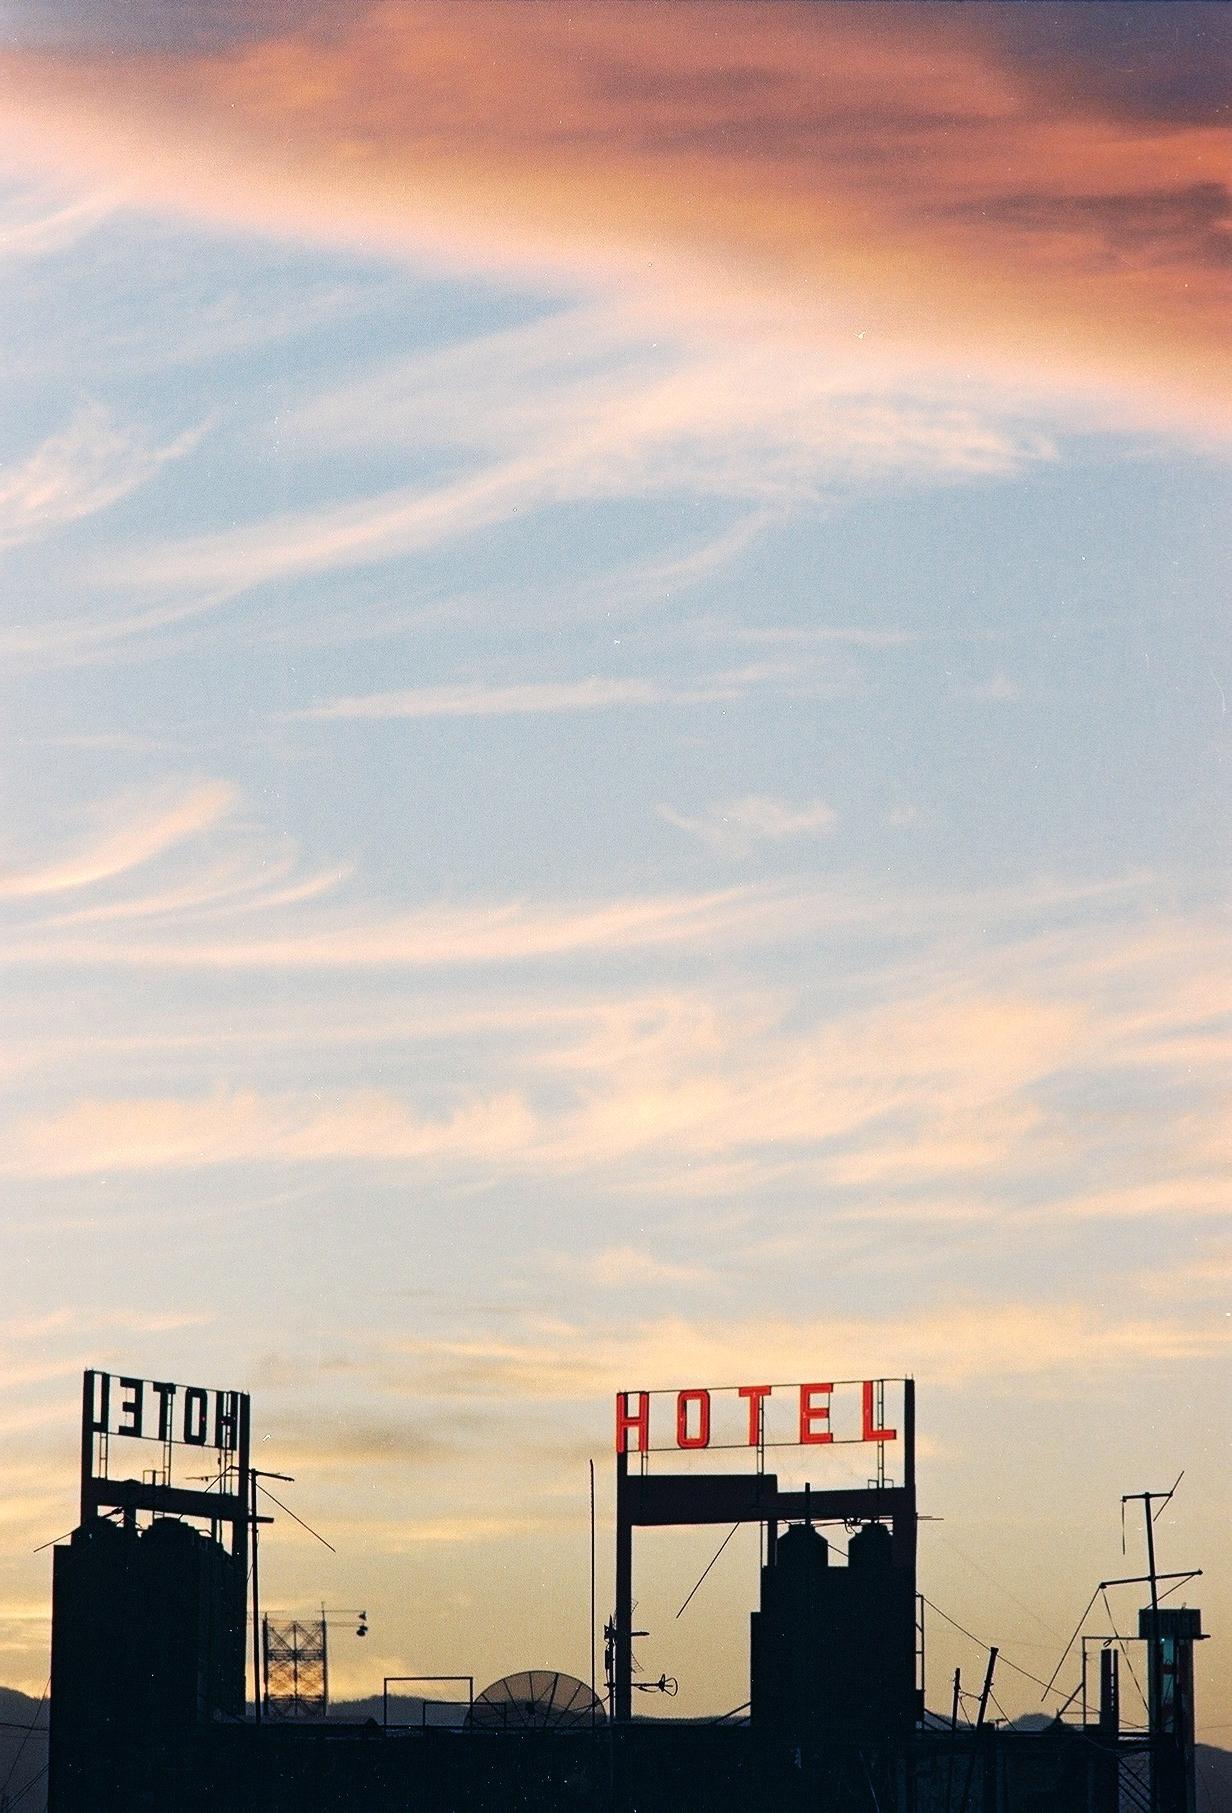 Franco Carino Zanotti | Hotel | Minolta SRT 101b 120mm